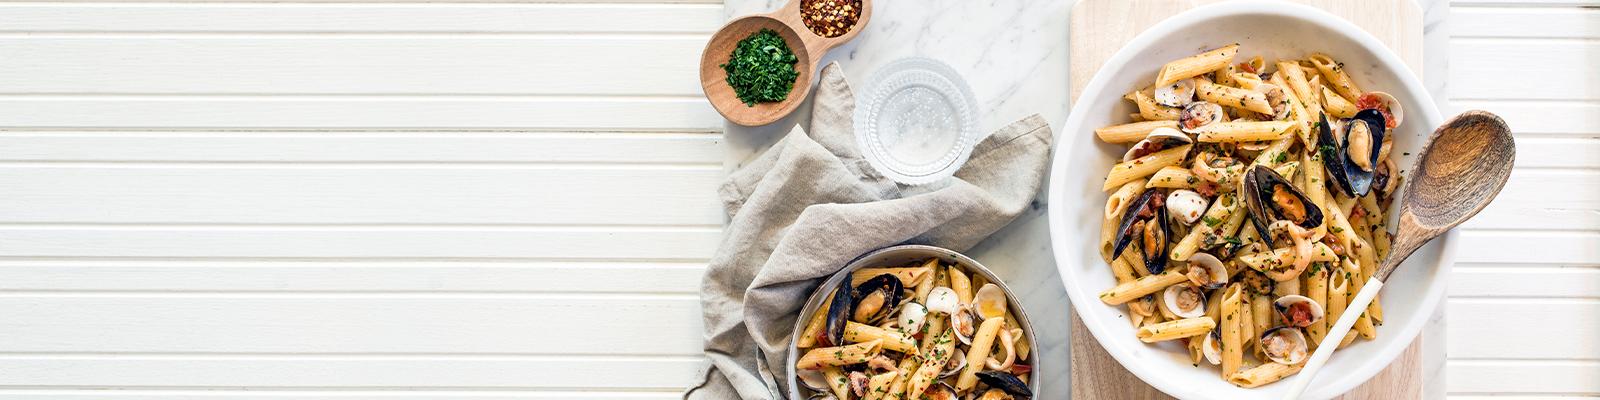 Pasta Garofalo - Nos Recettes